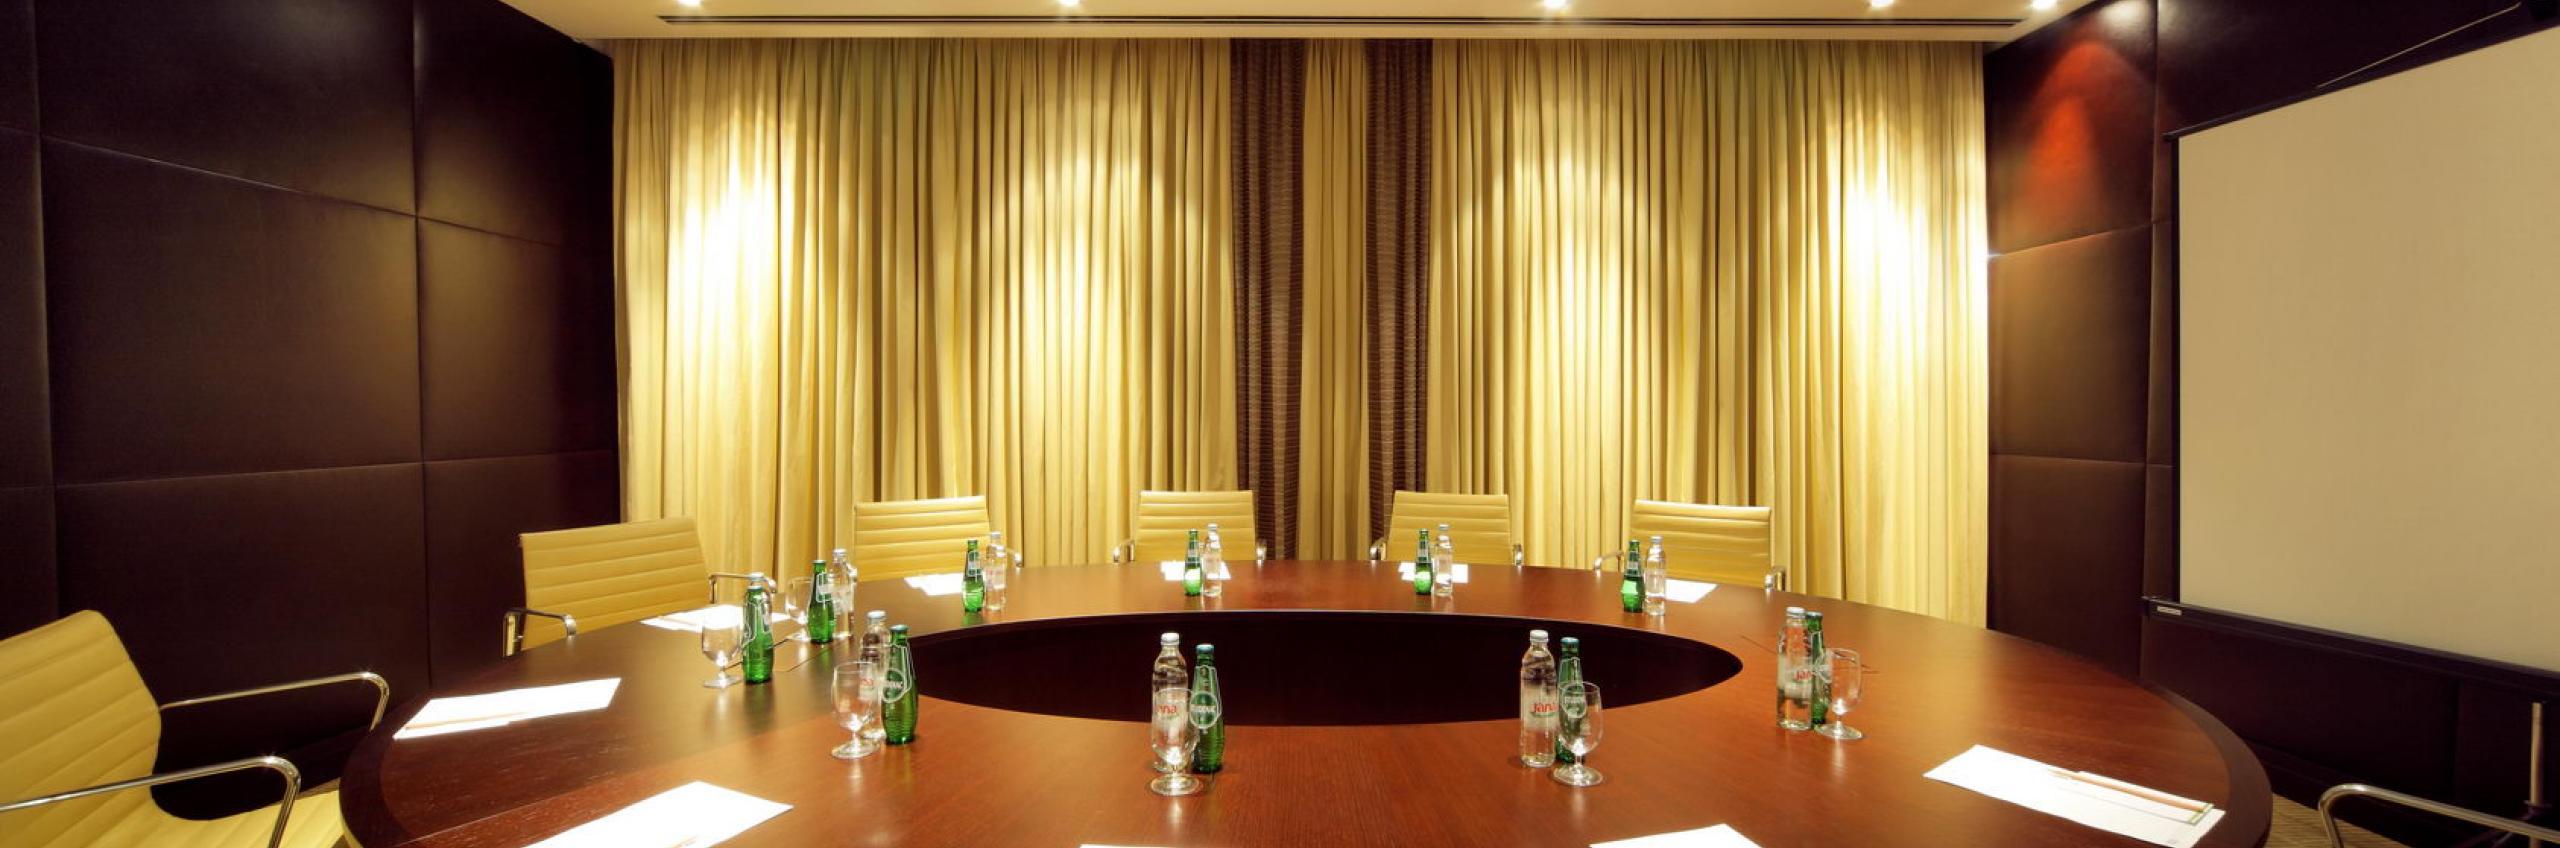 Amfora Deluxe boardroom